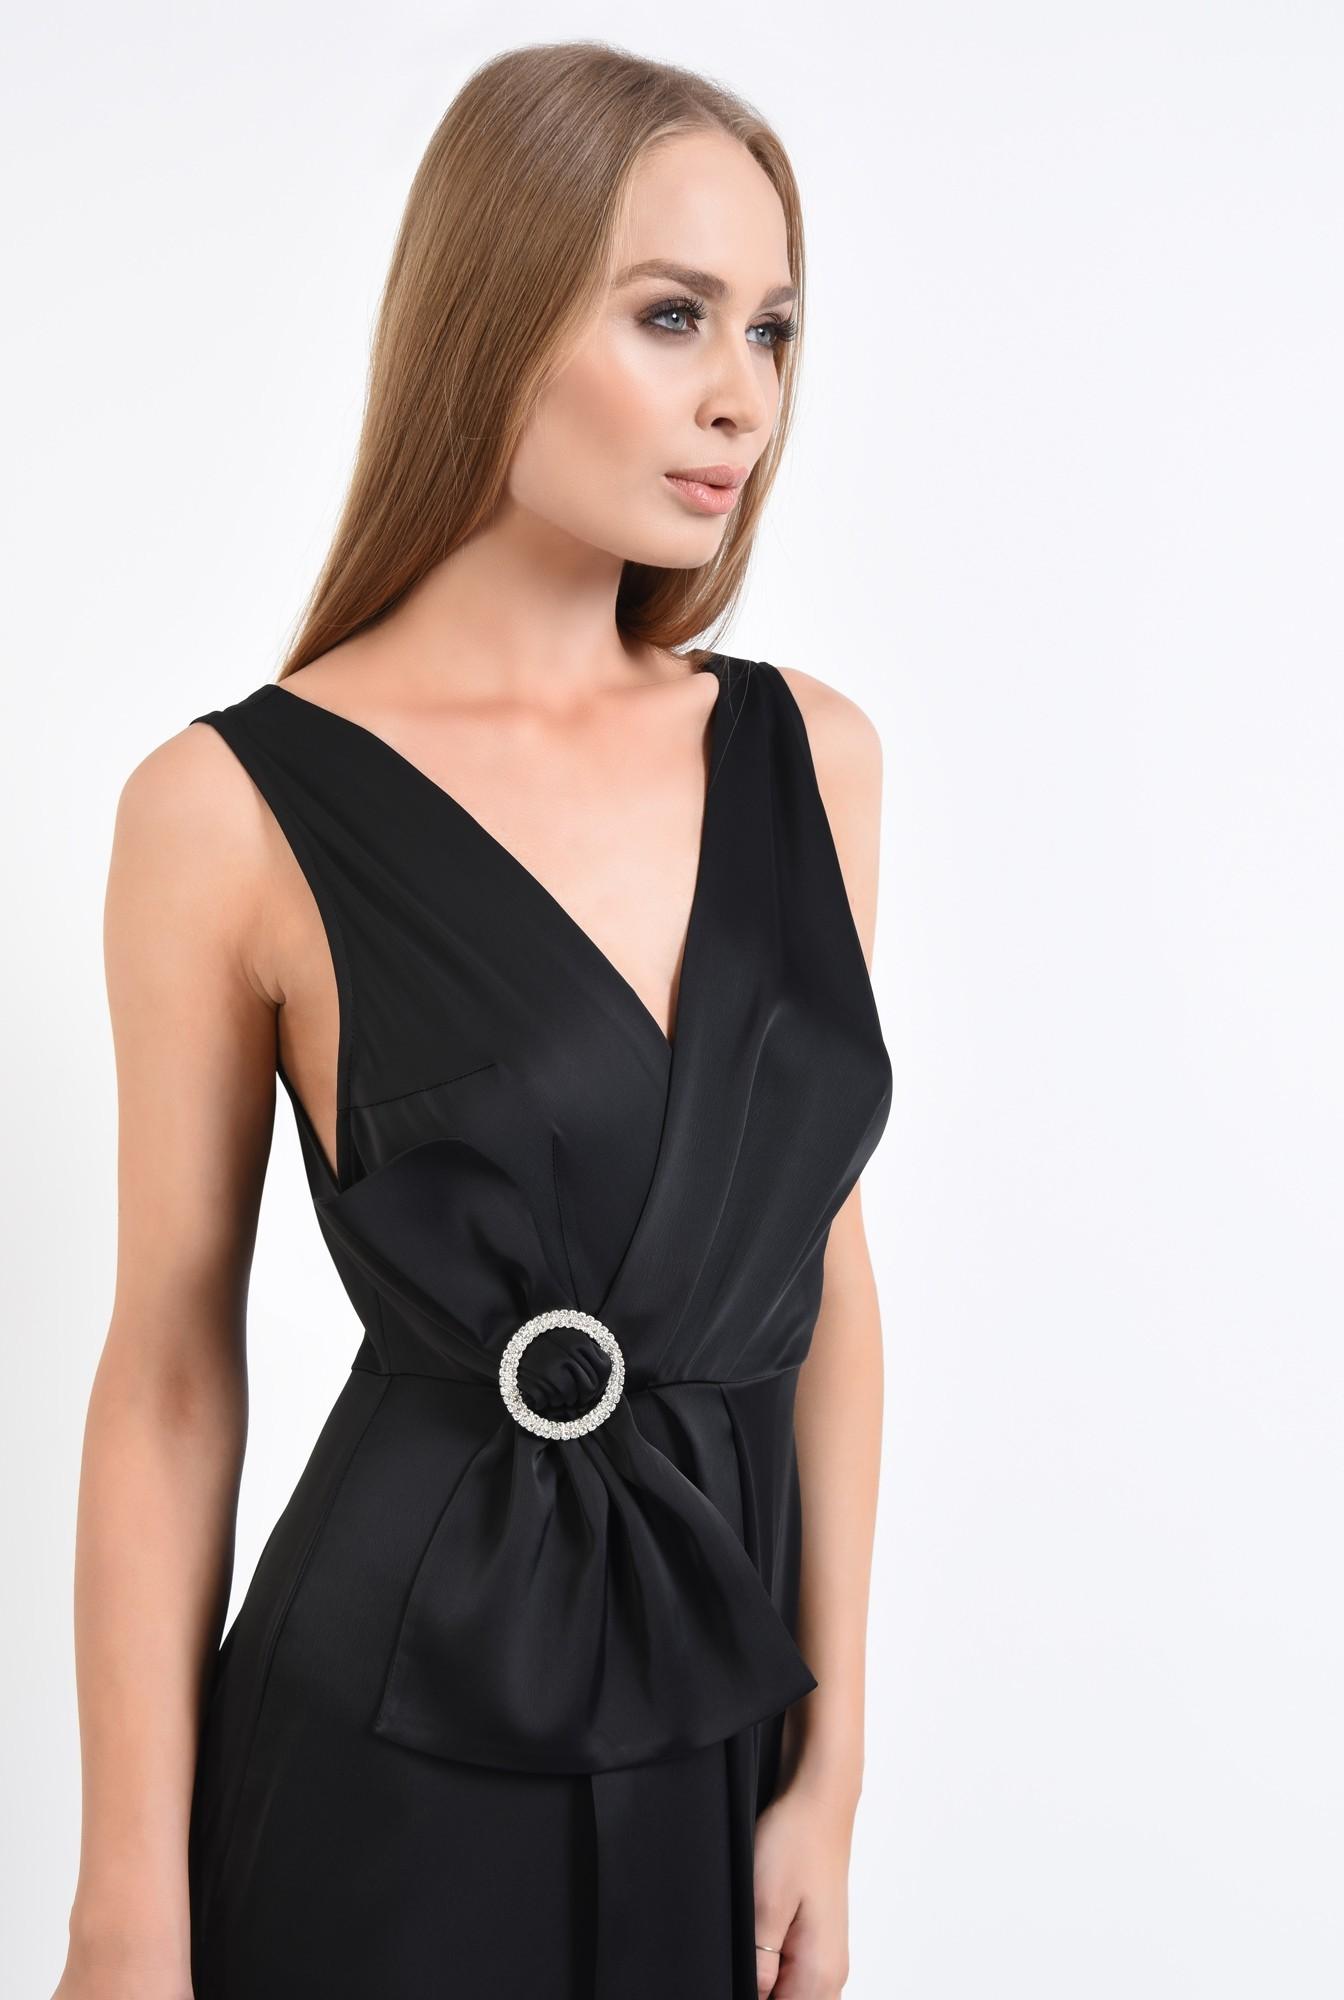 2 - rochie de seara, petrecuta, neagra, satin, cu funda, strasuri